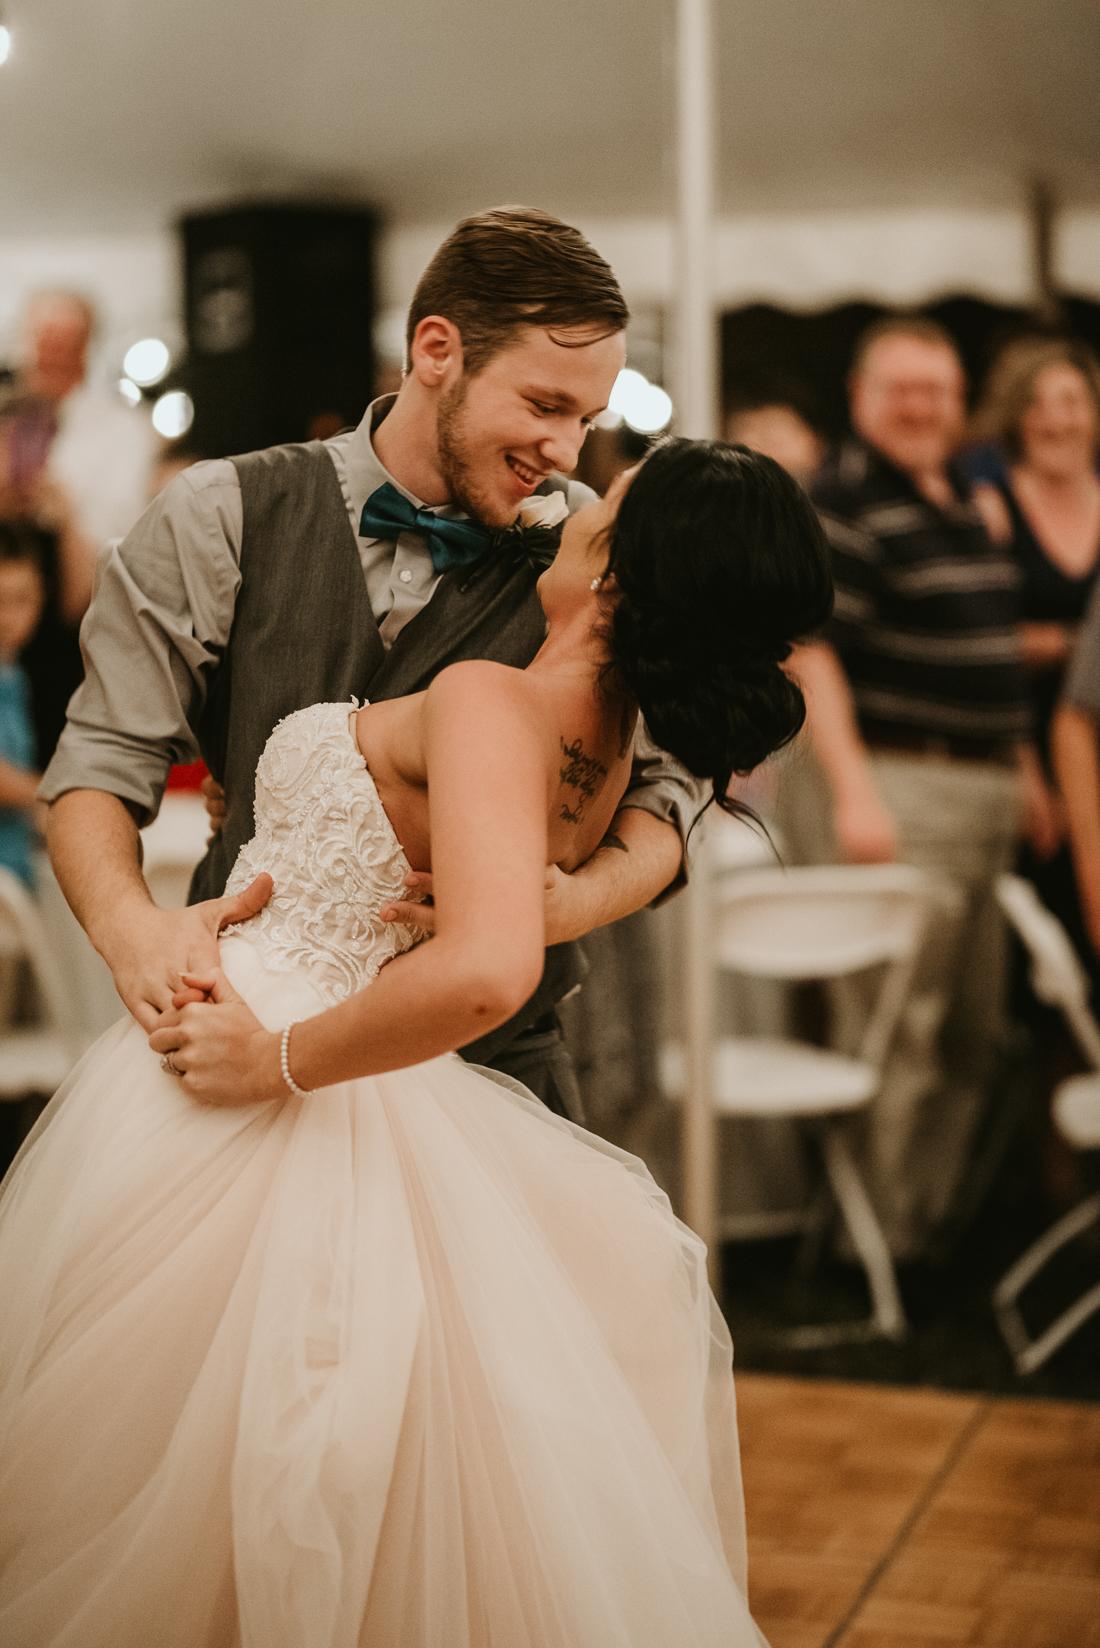 olivia_zay_wedding_09_2018-7839.jpg